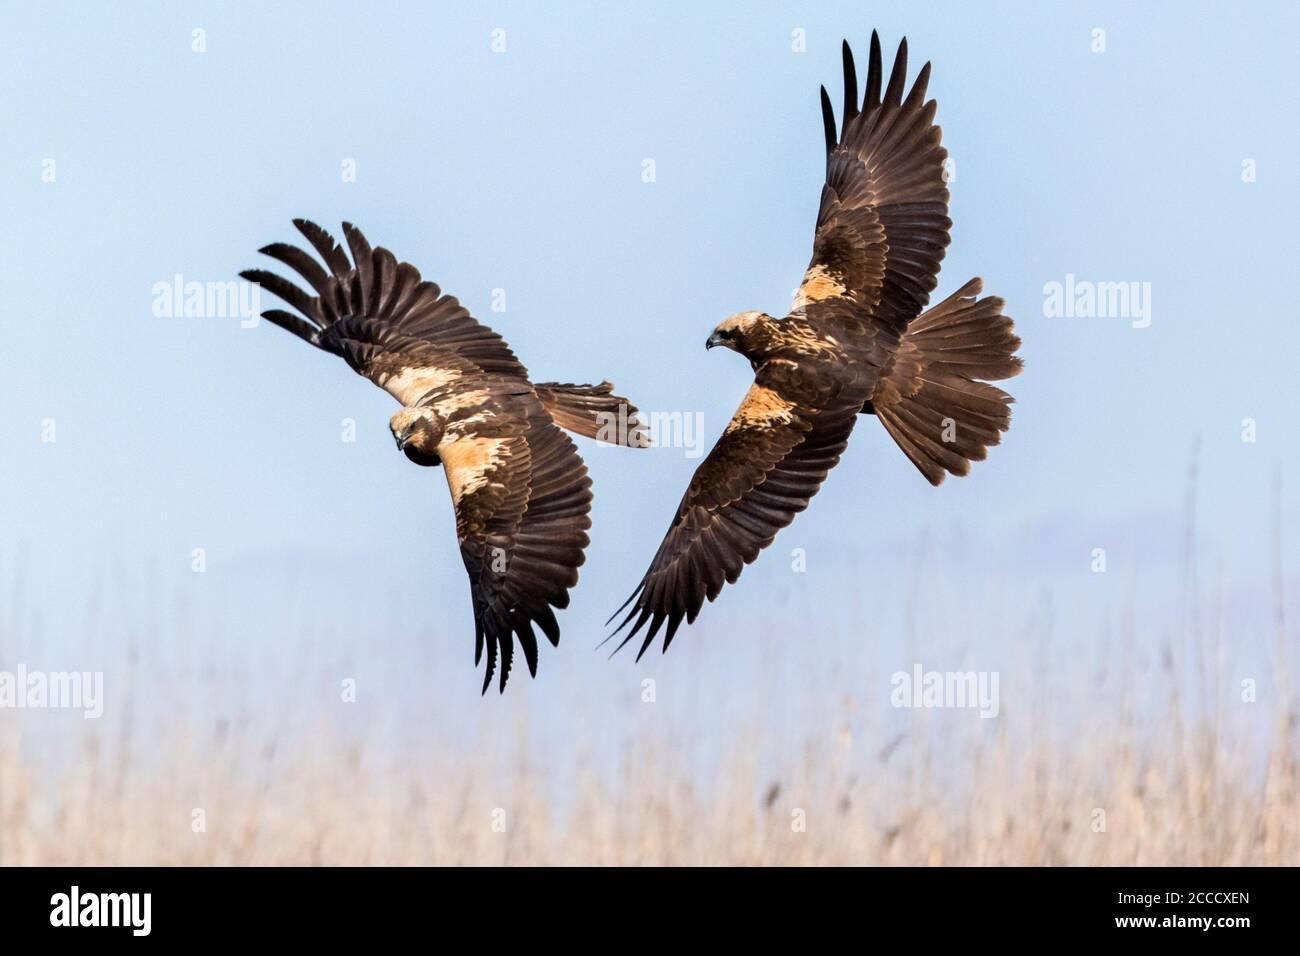 Two Western Marsh Harriers (Circus aeruginosus) fighting in midair near Toledo in Spain. Stock Photo